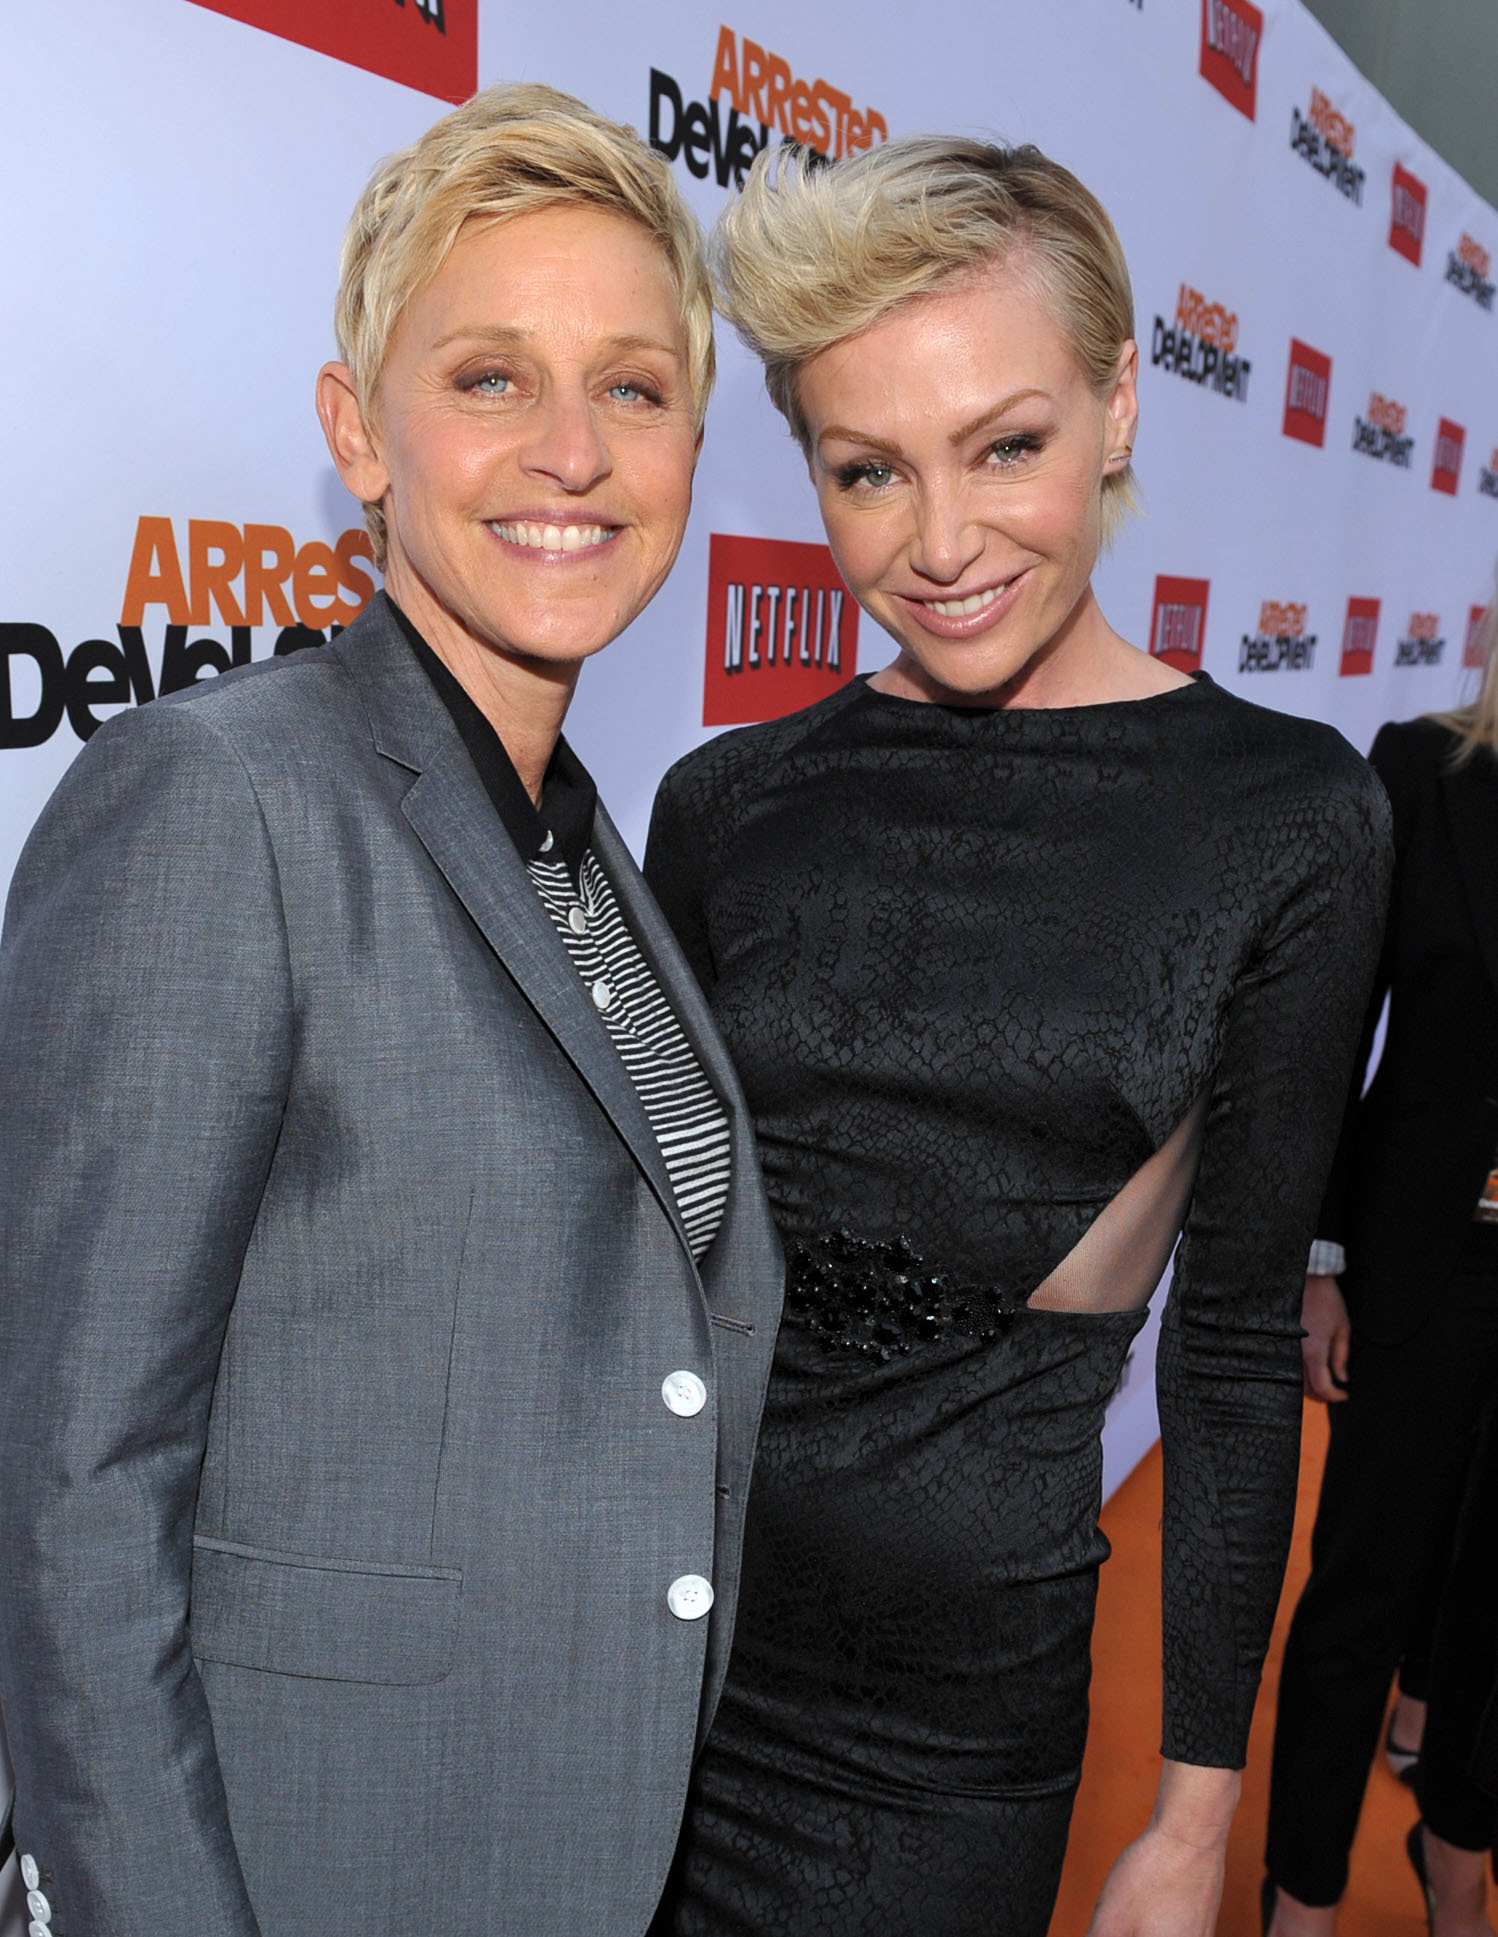 Ellen DeGeneres Portia DeRossi Arrested premiere